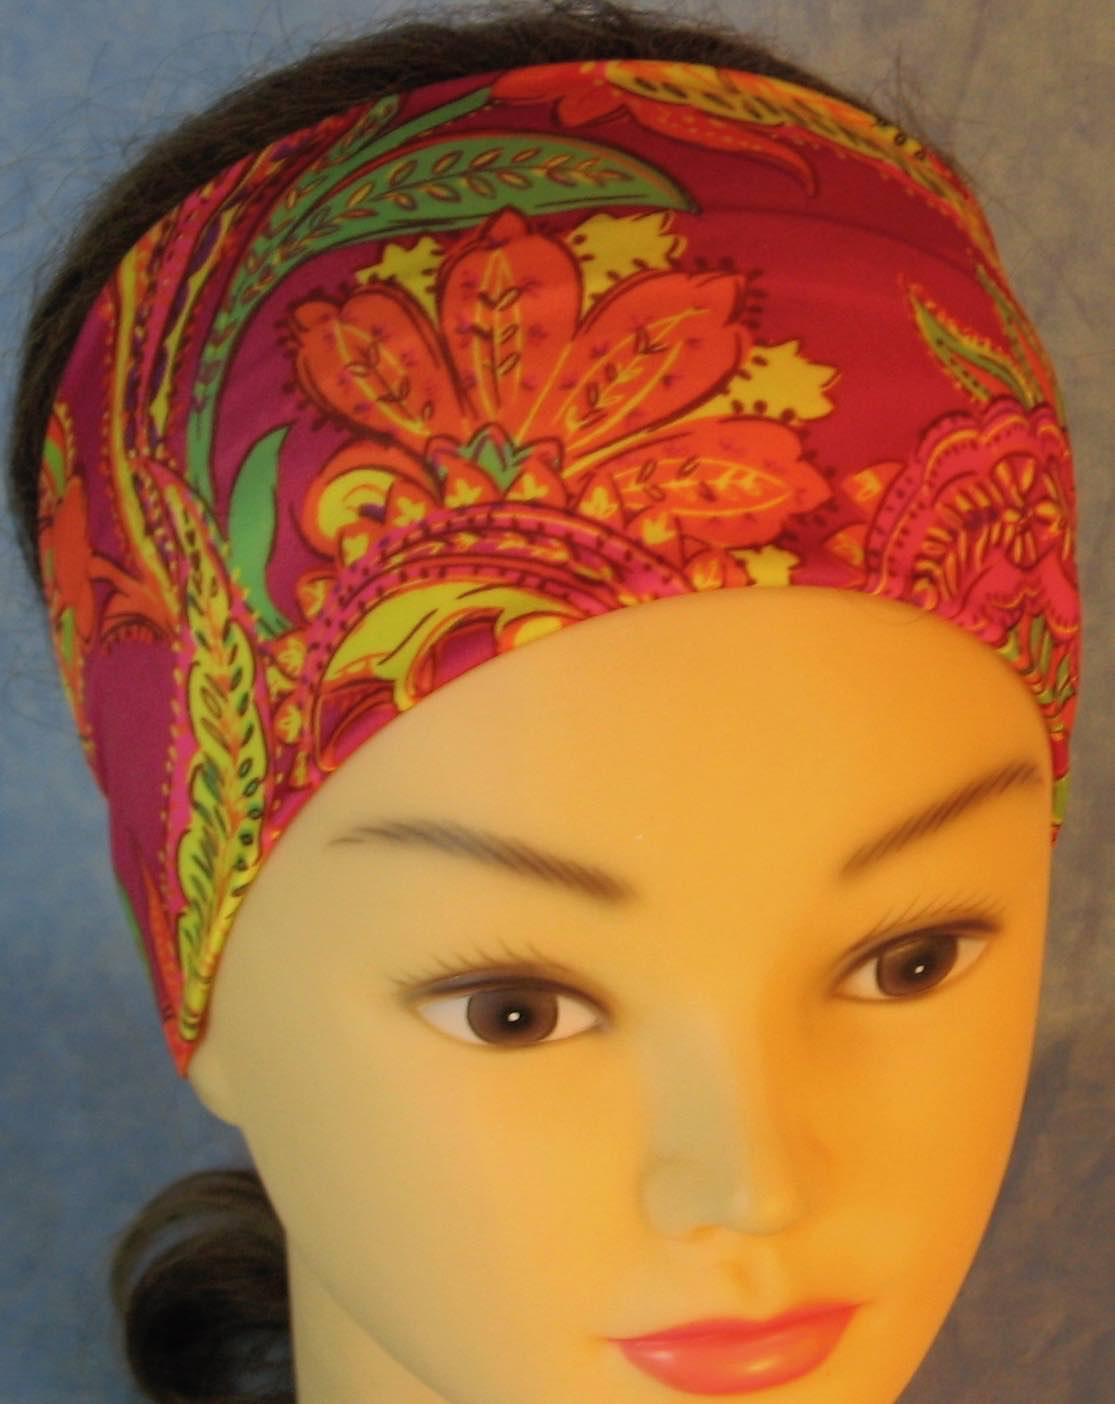 Headband-Yellow Orange Green Paisley on Pink-front top